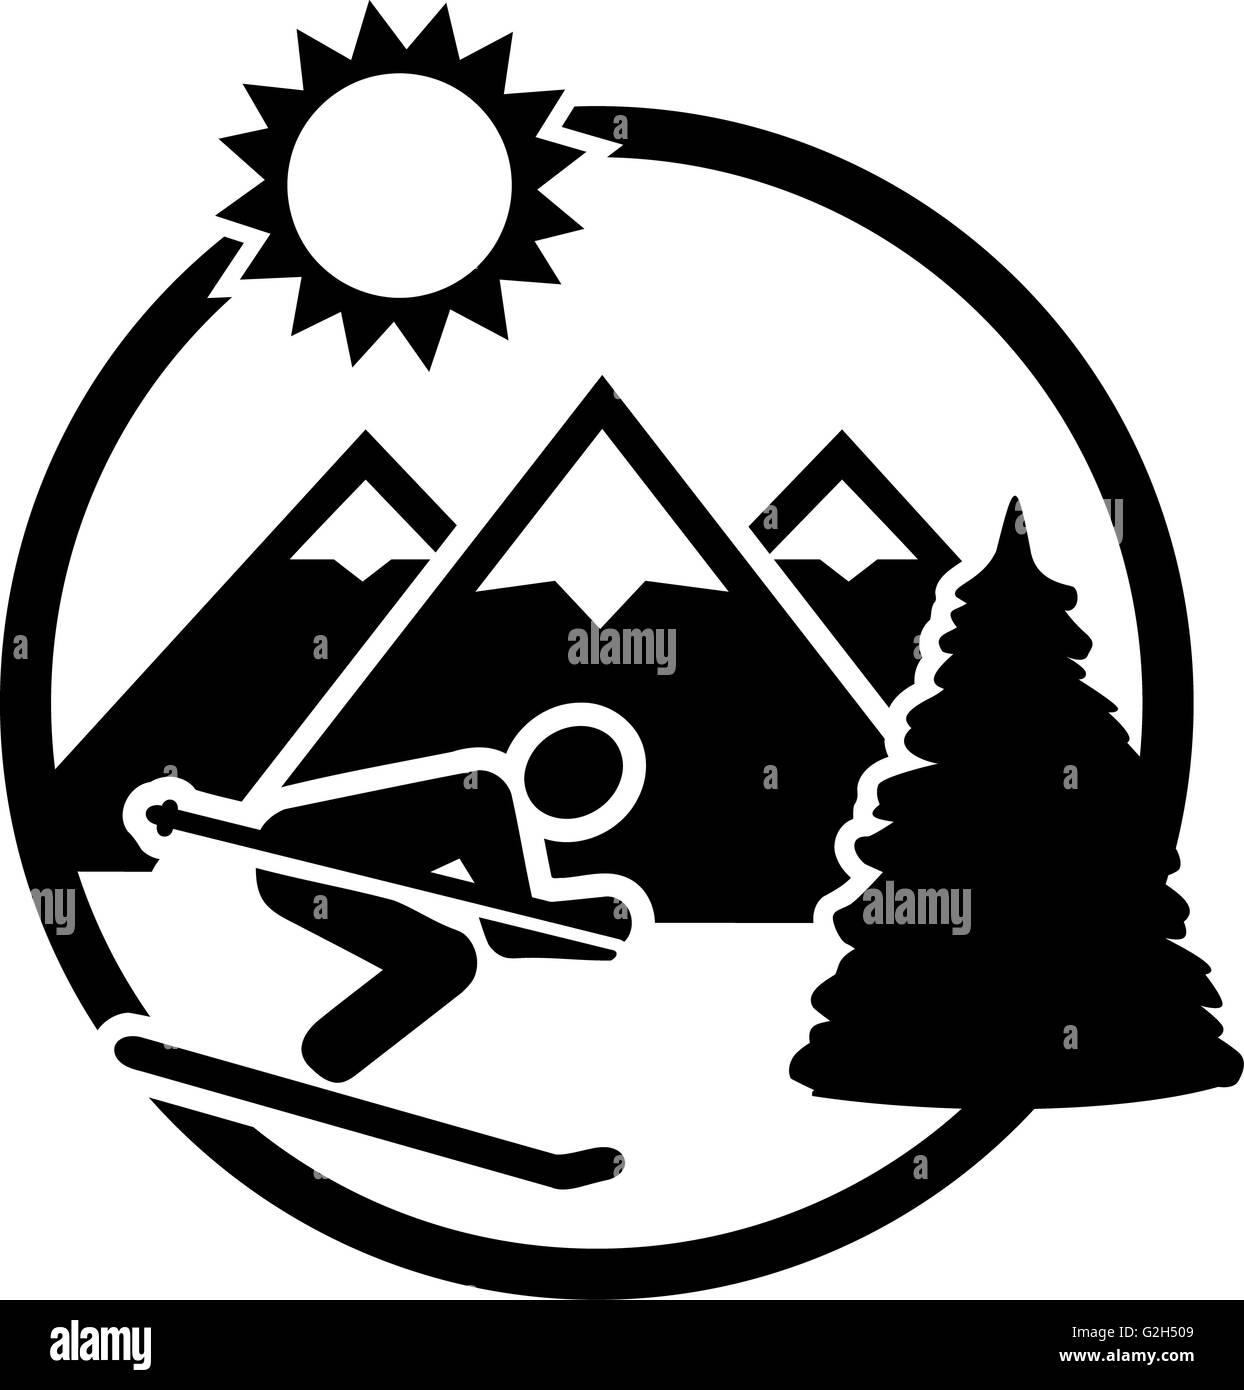 Ski Mountains Badge - Stock Image